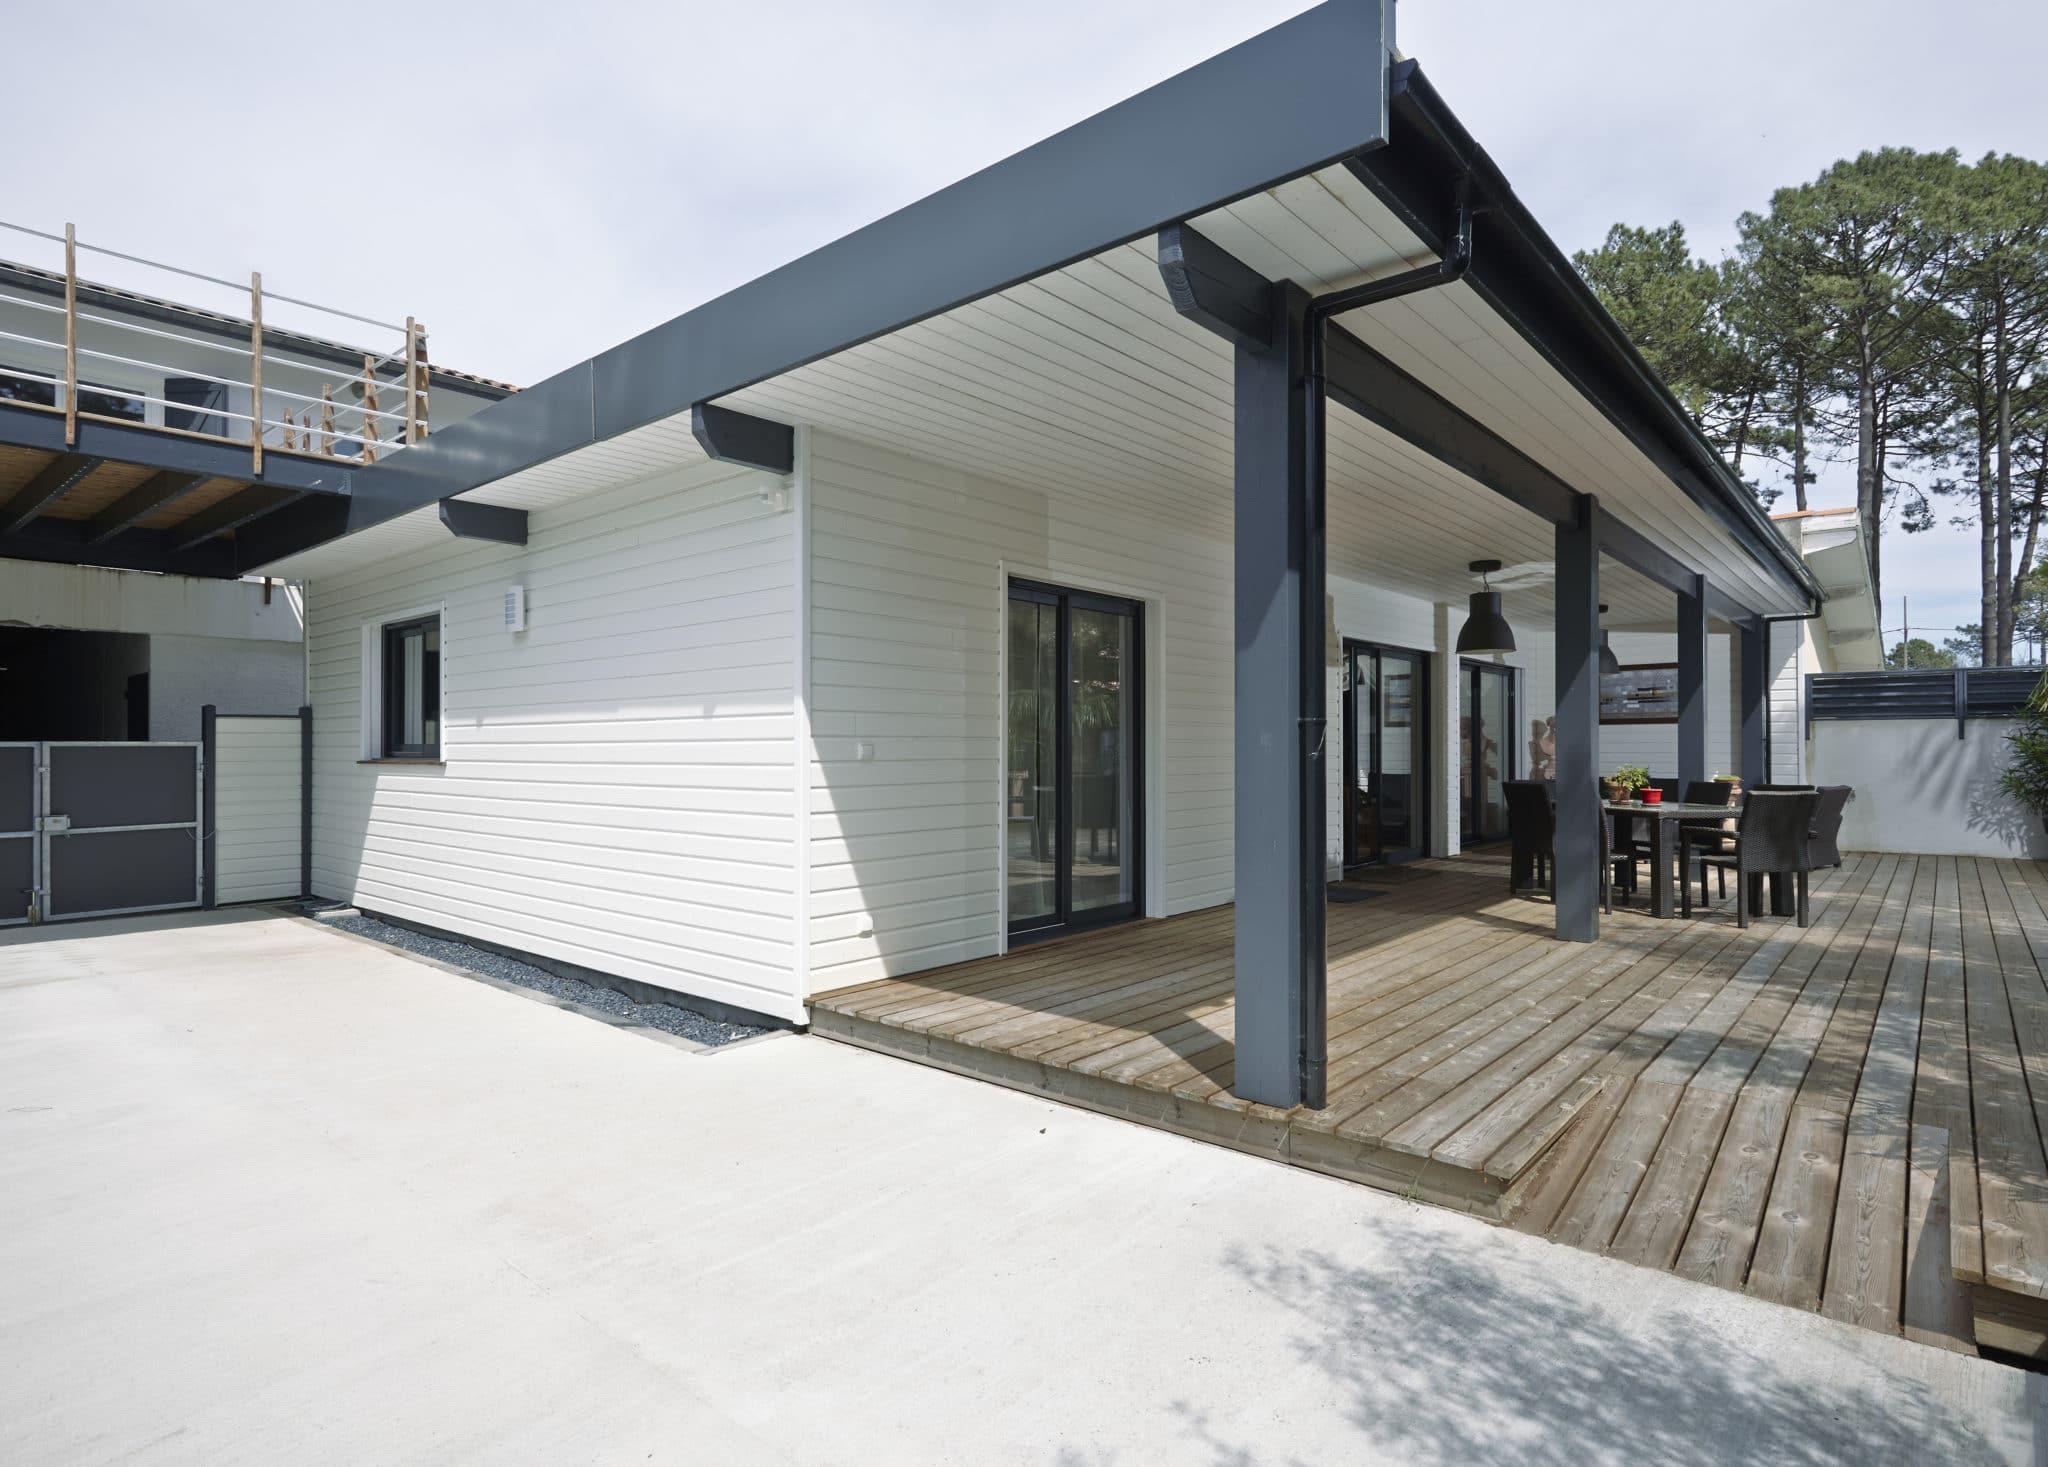 rabovert n li couleur architecture bois magazine. Black Bedroom Furniture Sets. Home Design Ideas